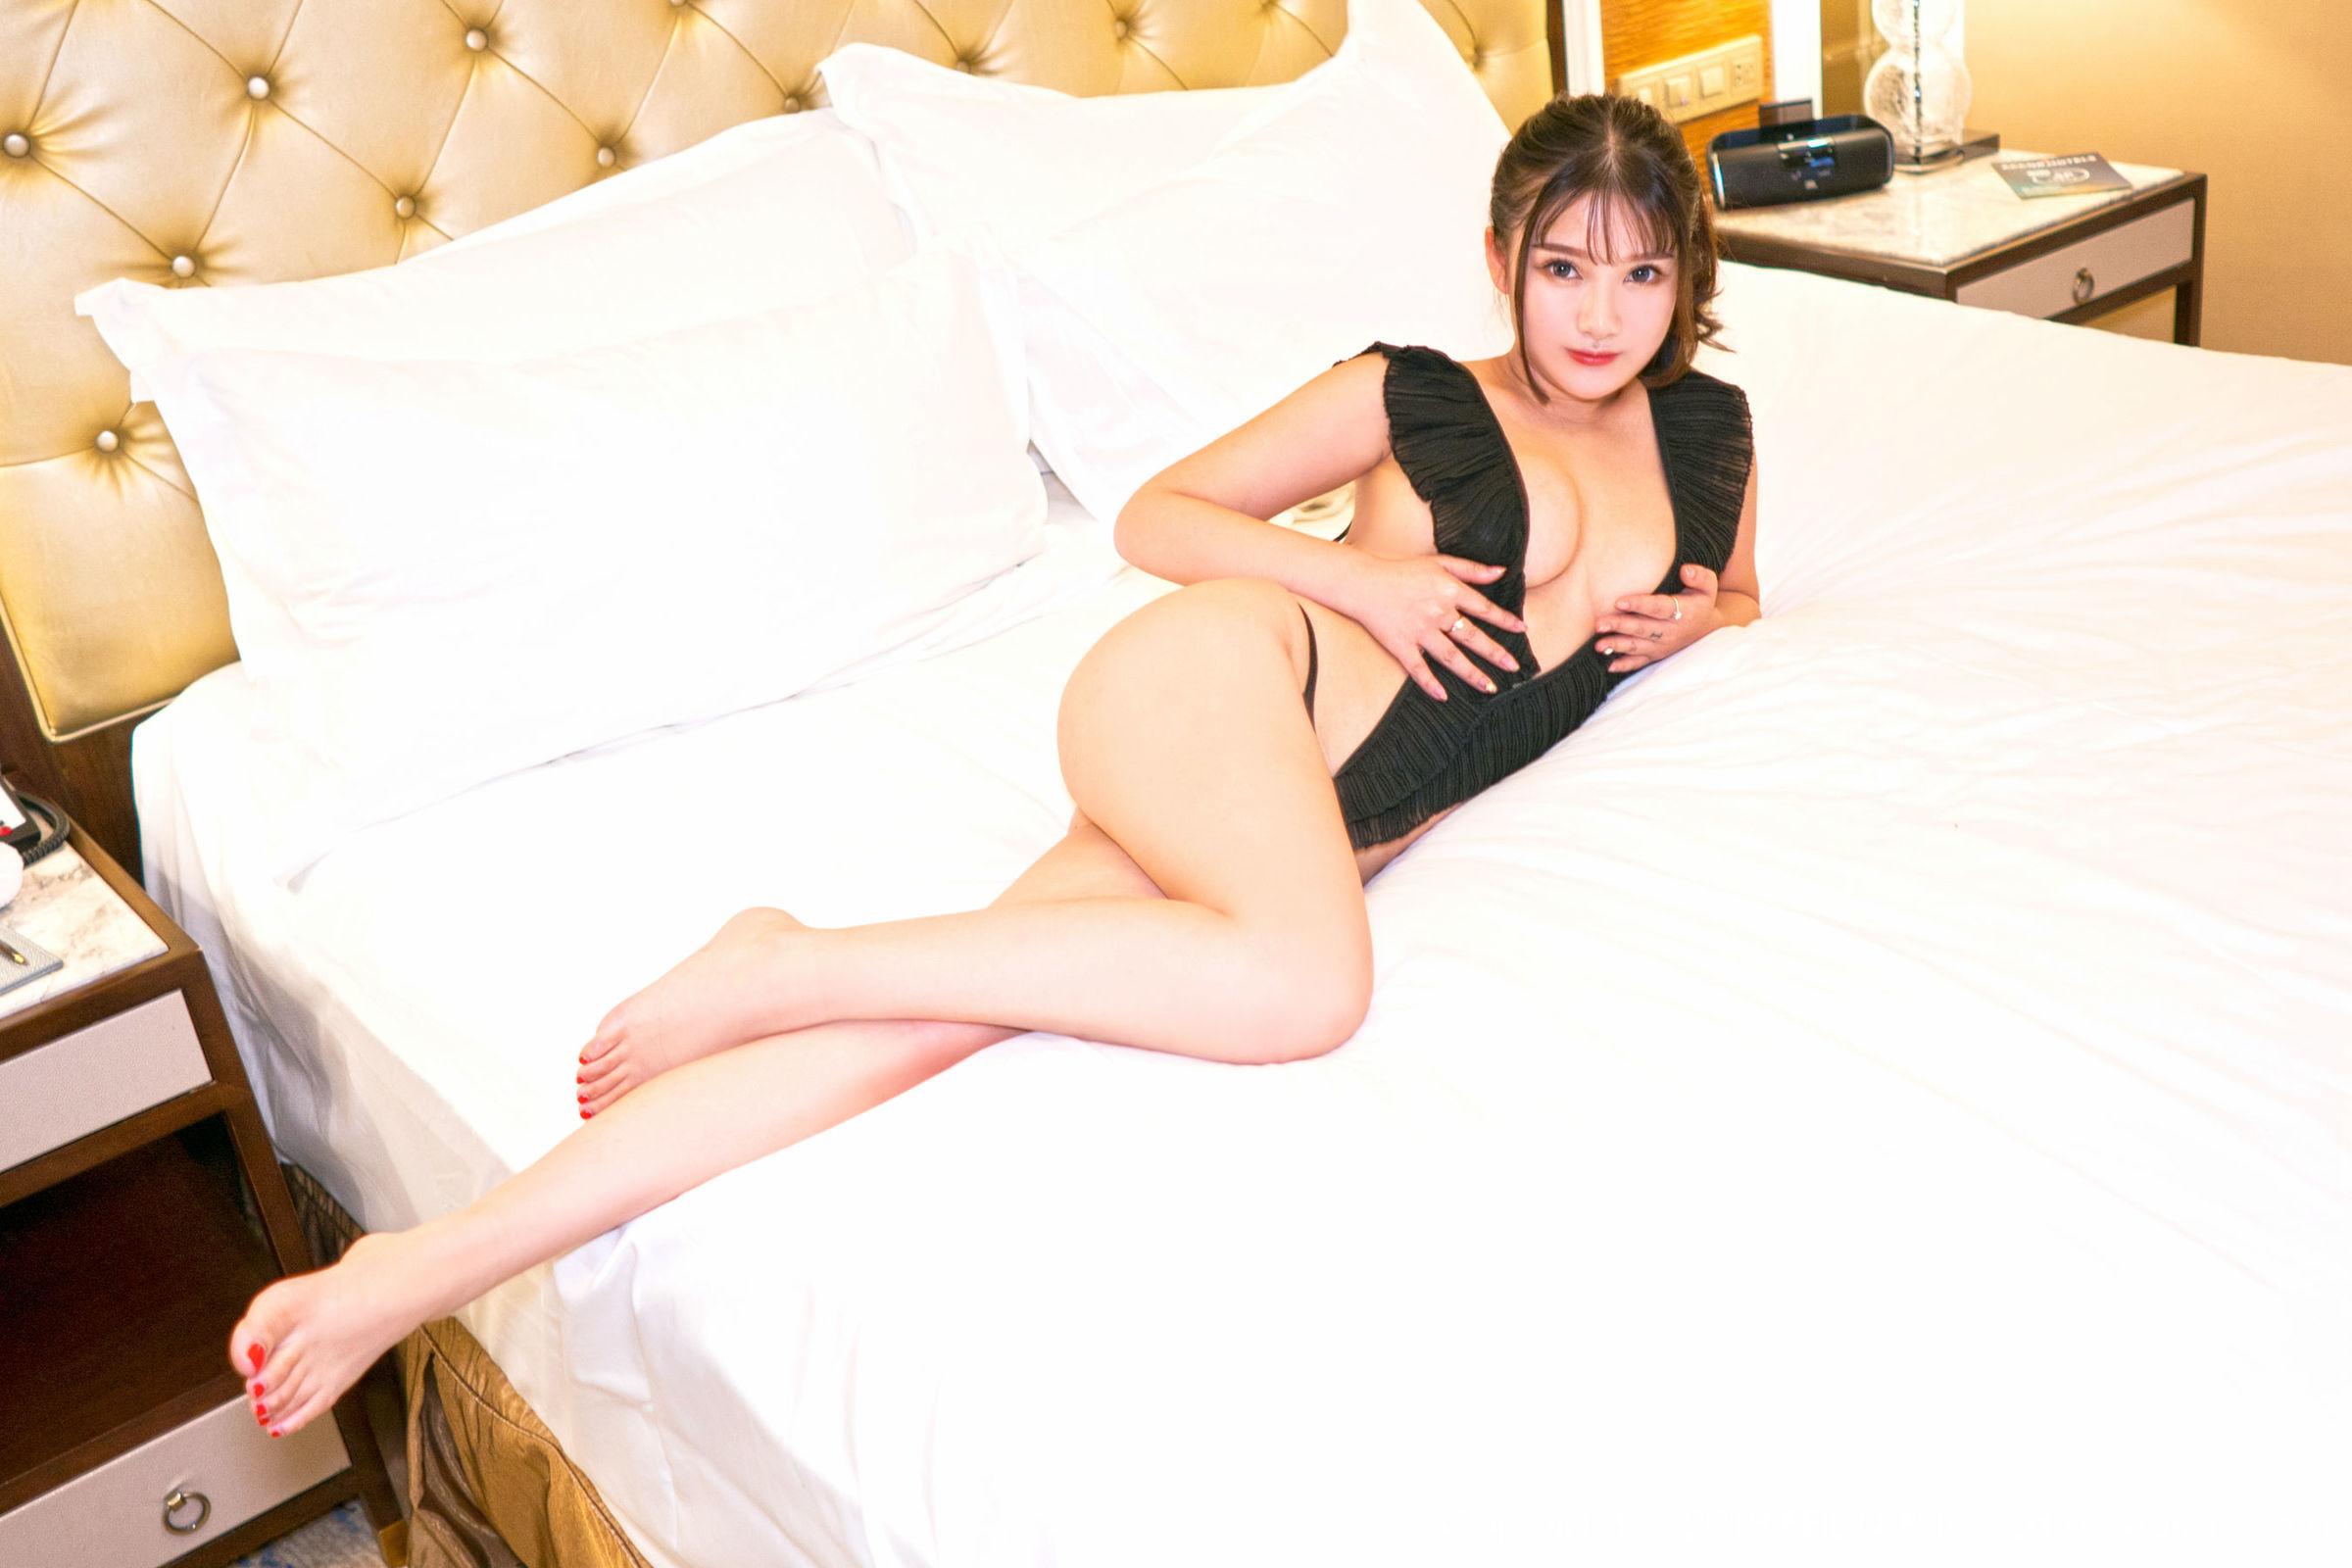 [FEILIN嗲囡囡] VOL.174 童颜巨乳模特@露露小喵_性感私房丝袜美图[47P]